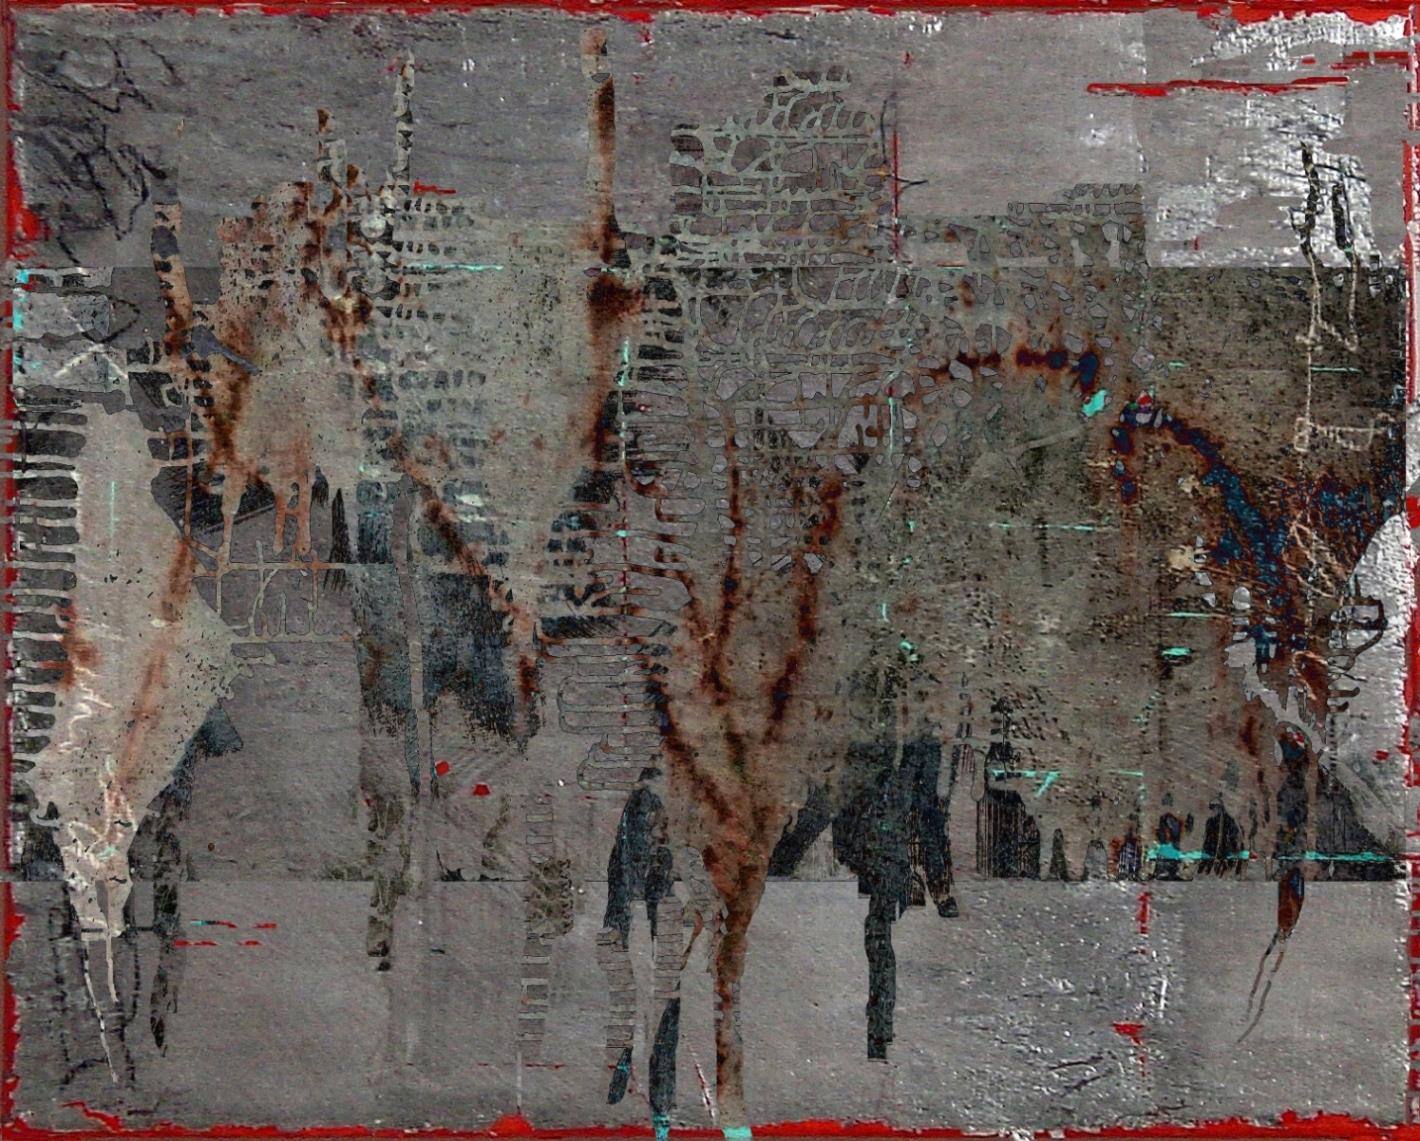 13-15 Mischtechnik Blattsilber Leinwand 40 x 50 cm_Siler Leaf-Braun